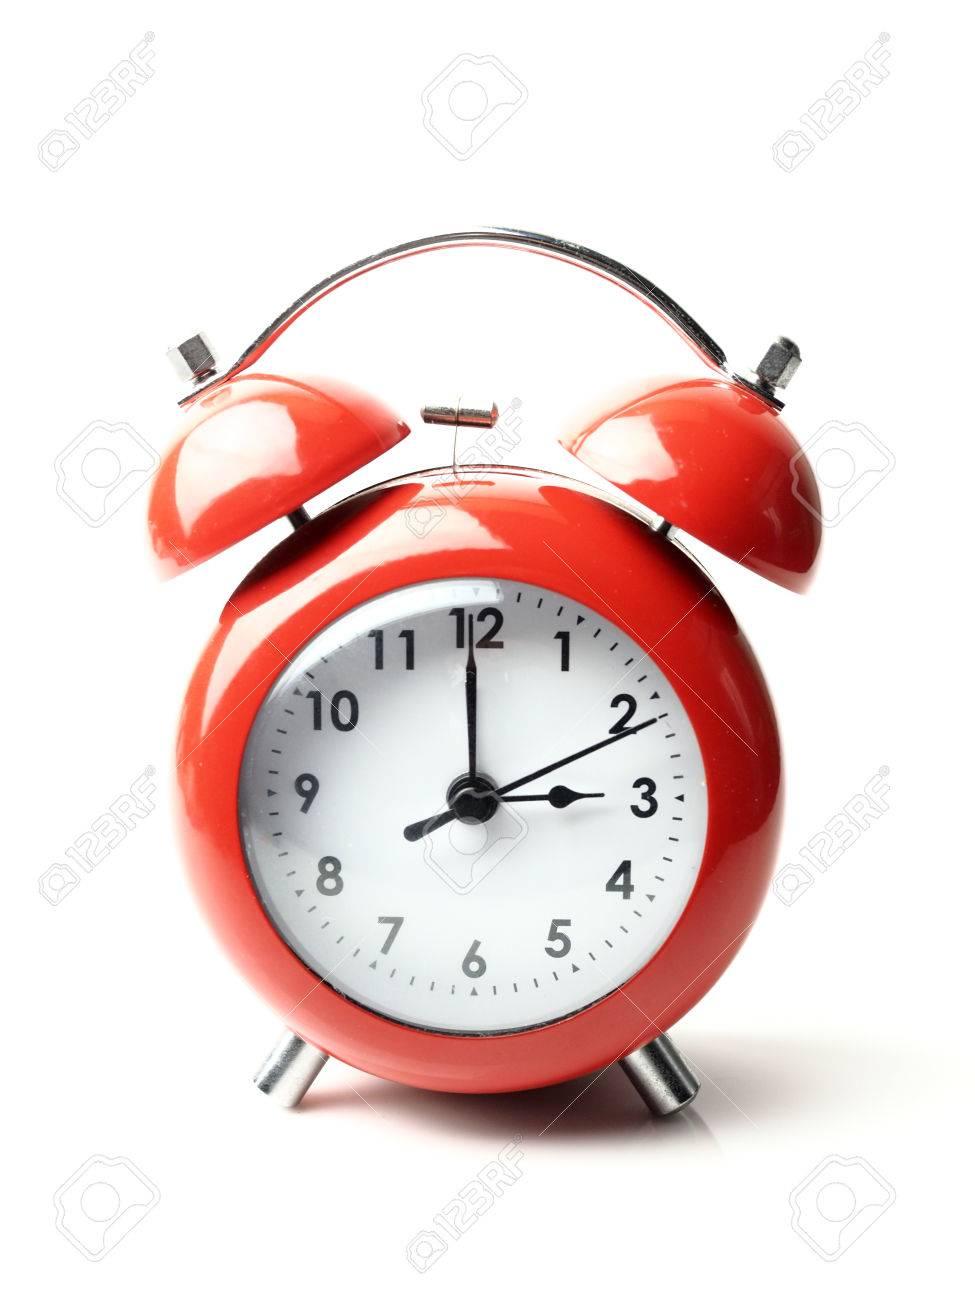 vintage retro red alarm clock 3 o clock isolate white background rh 123rf com Clock 6 7 O'Clock Clip Art